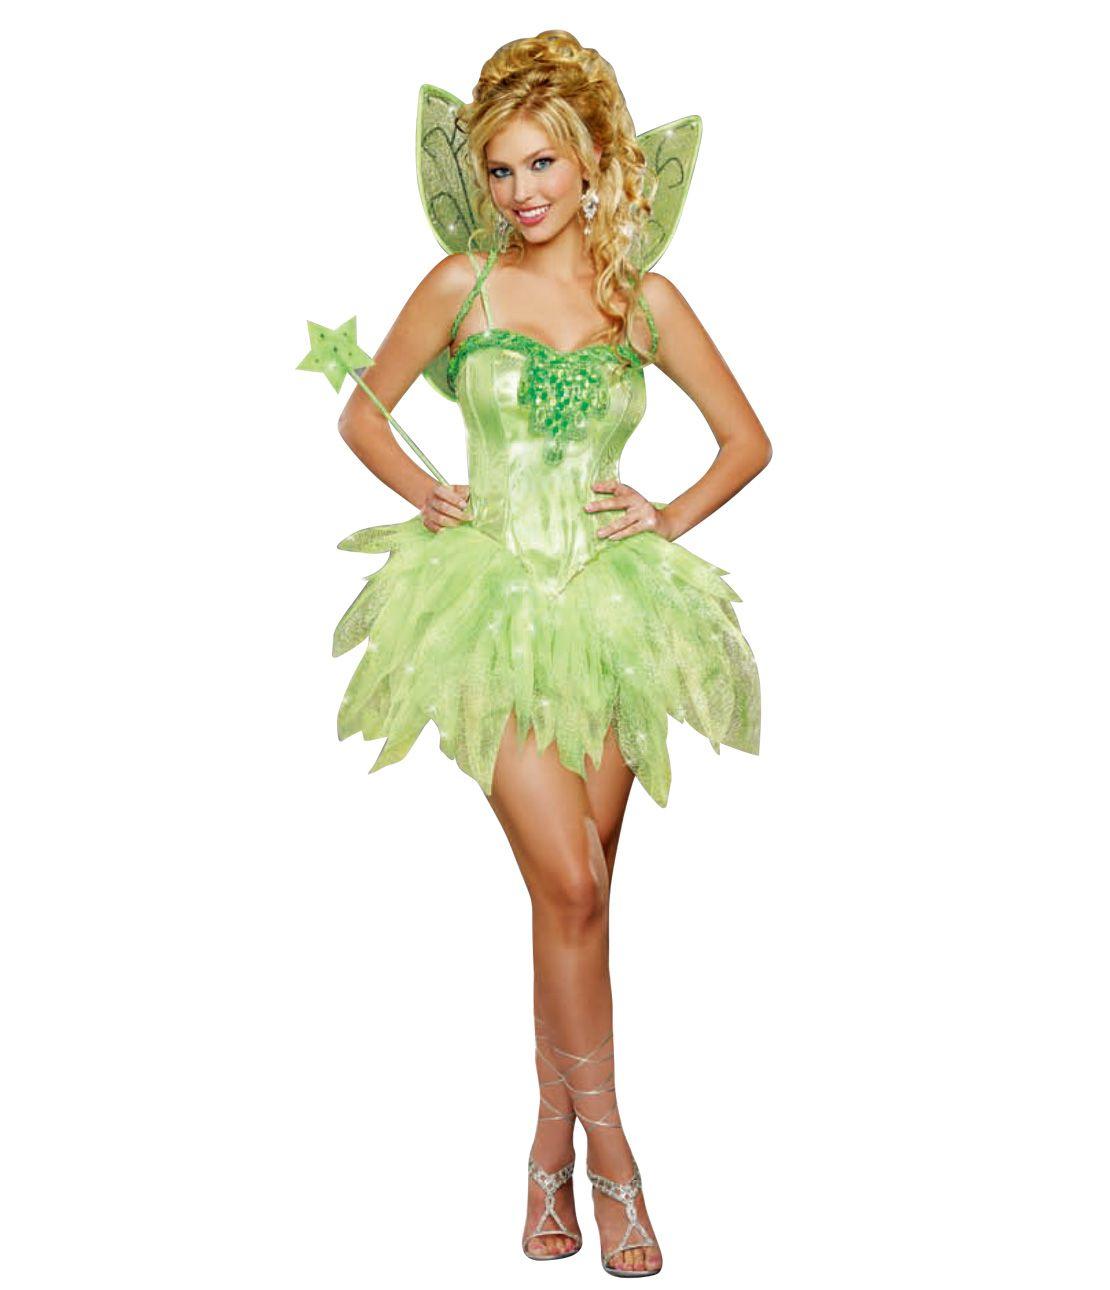 Fairy Costume Set (Dress, Wing, Stick)